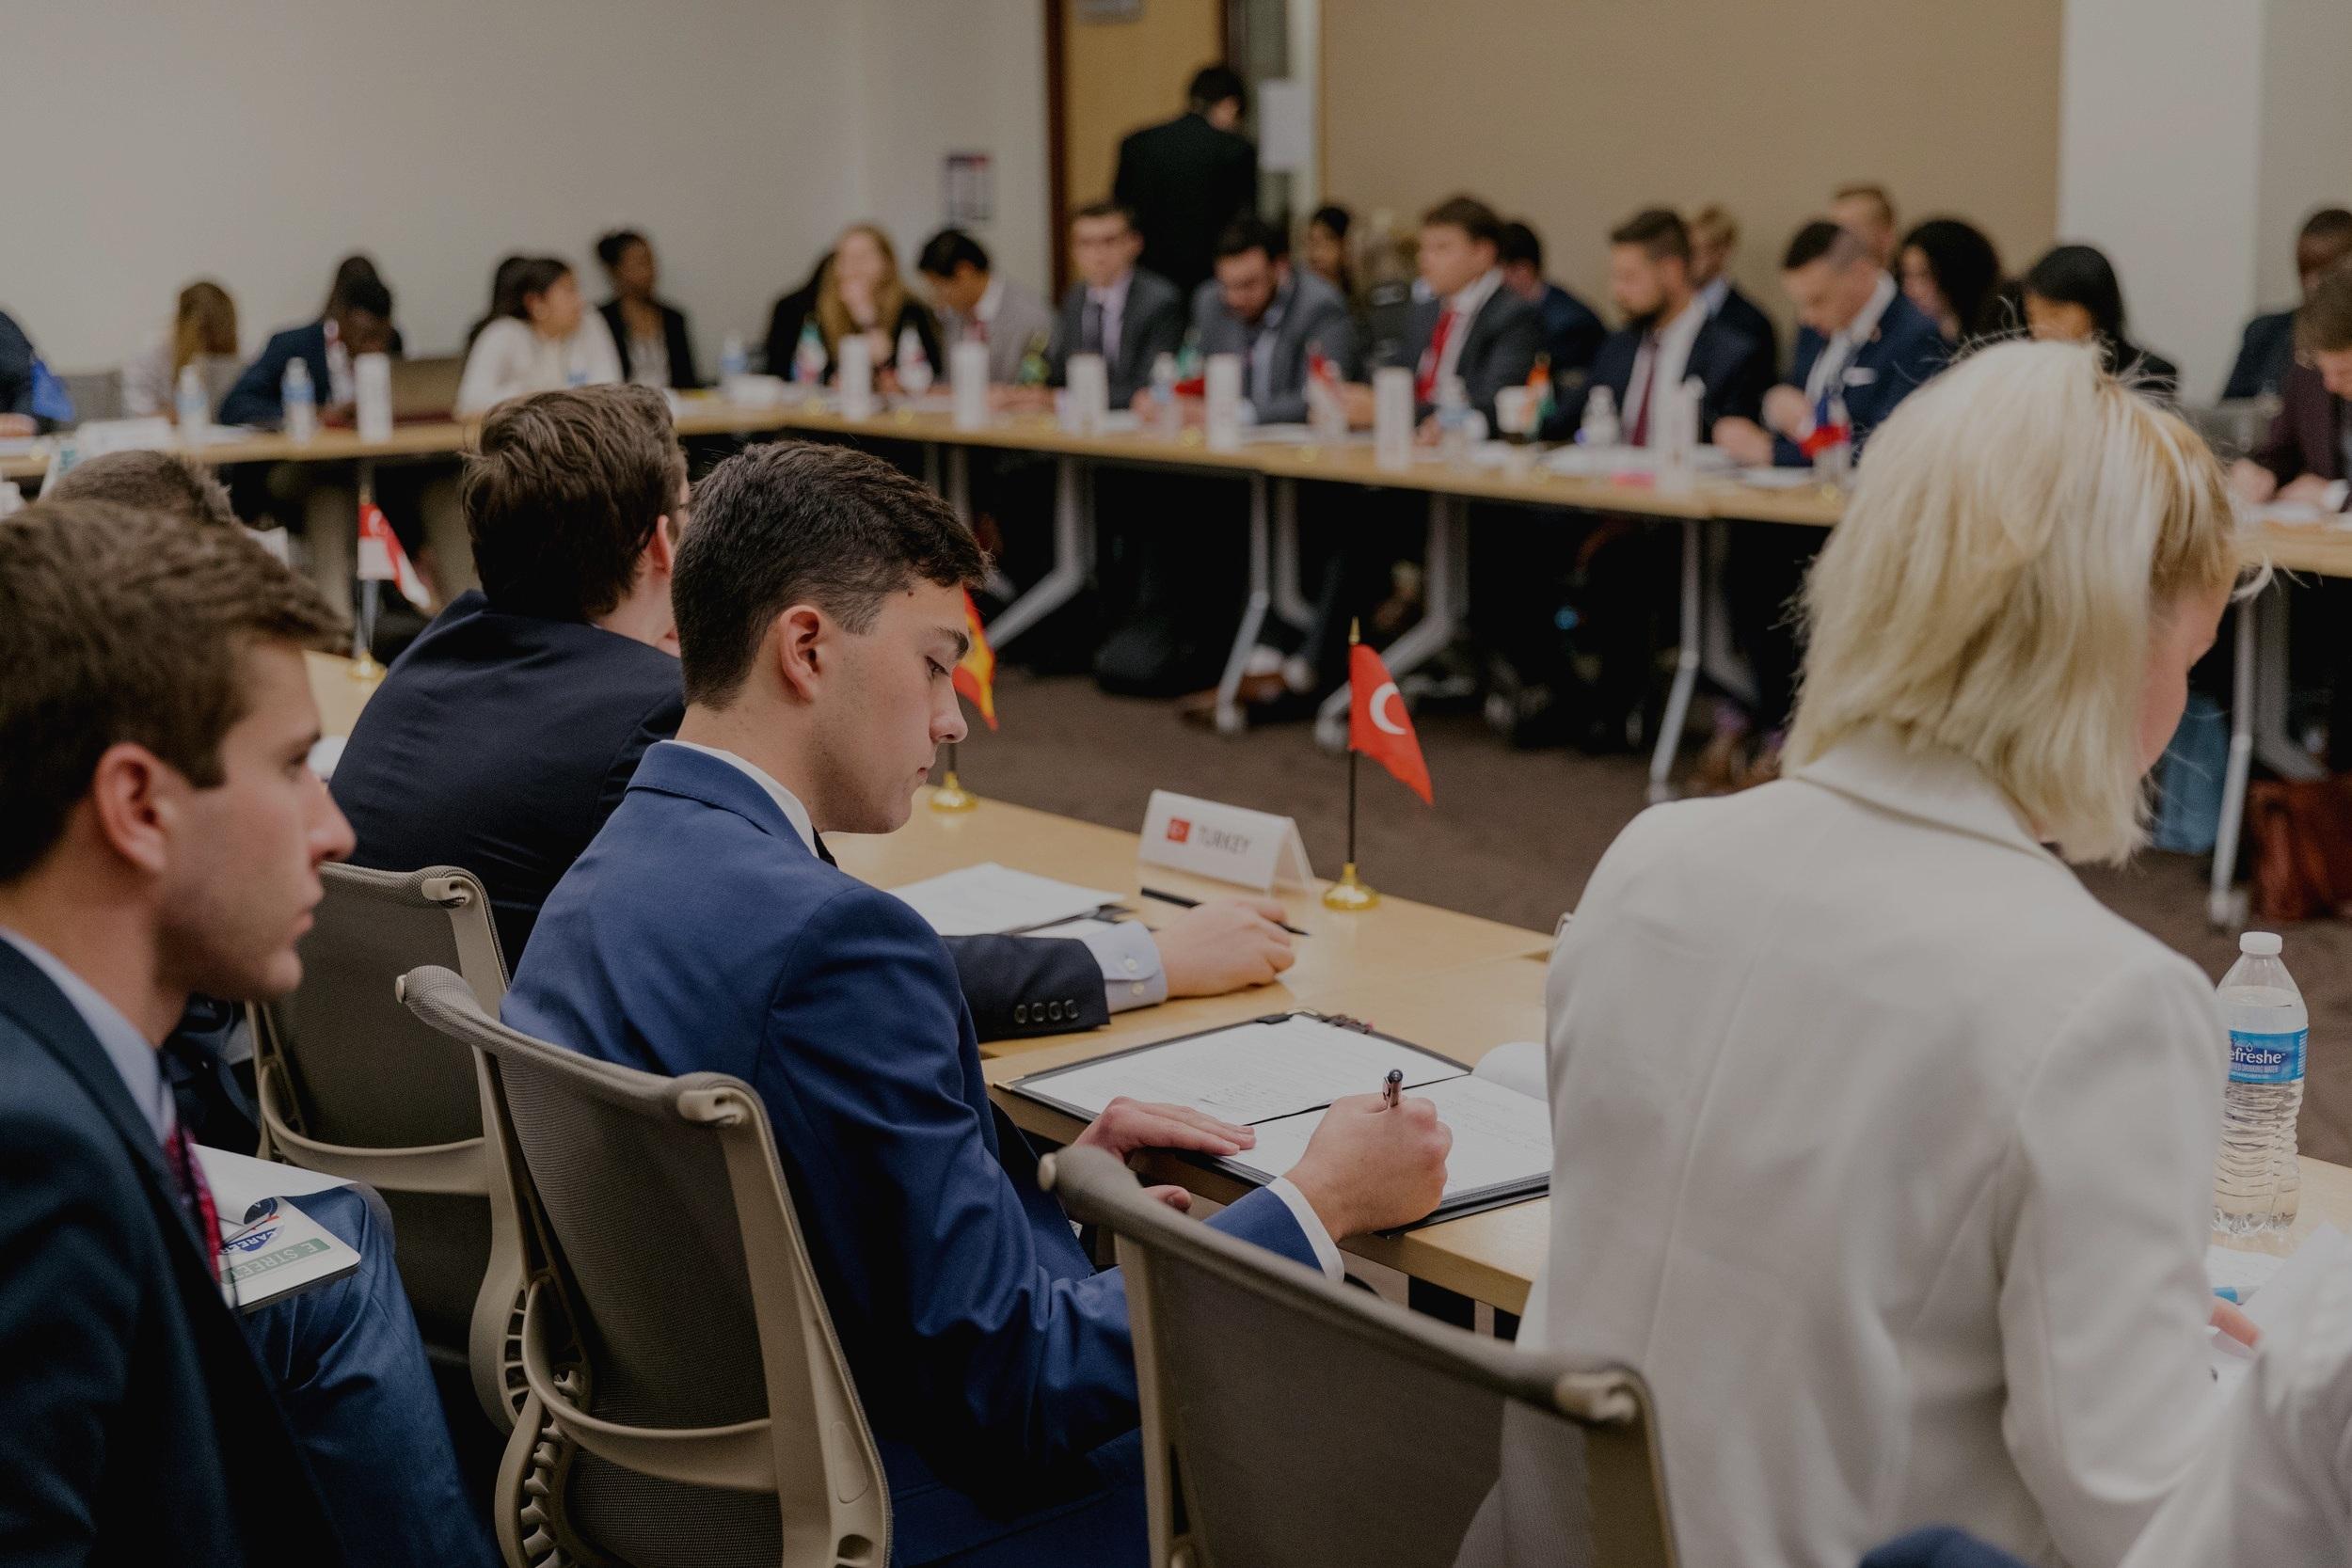 Finance Track - The 2019 topics will be:International Taxation & DigitizationRising DebtThe Future of Trade & WTO Reform